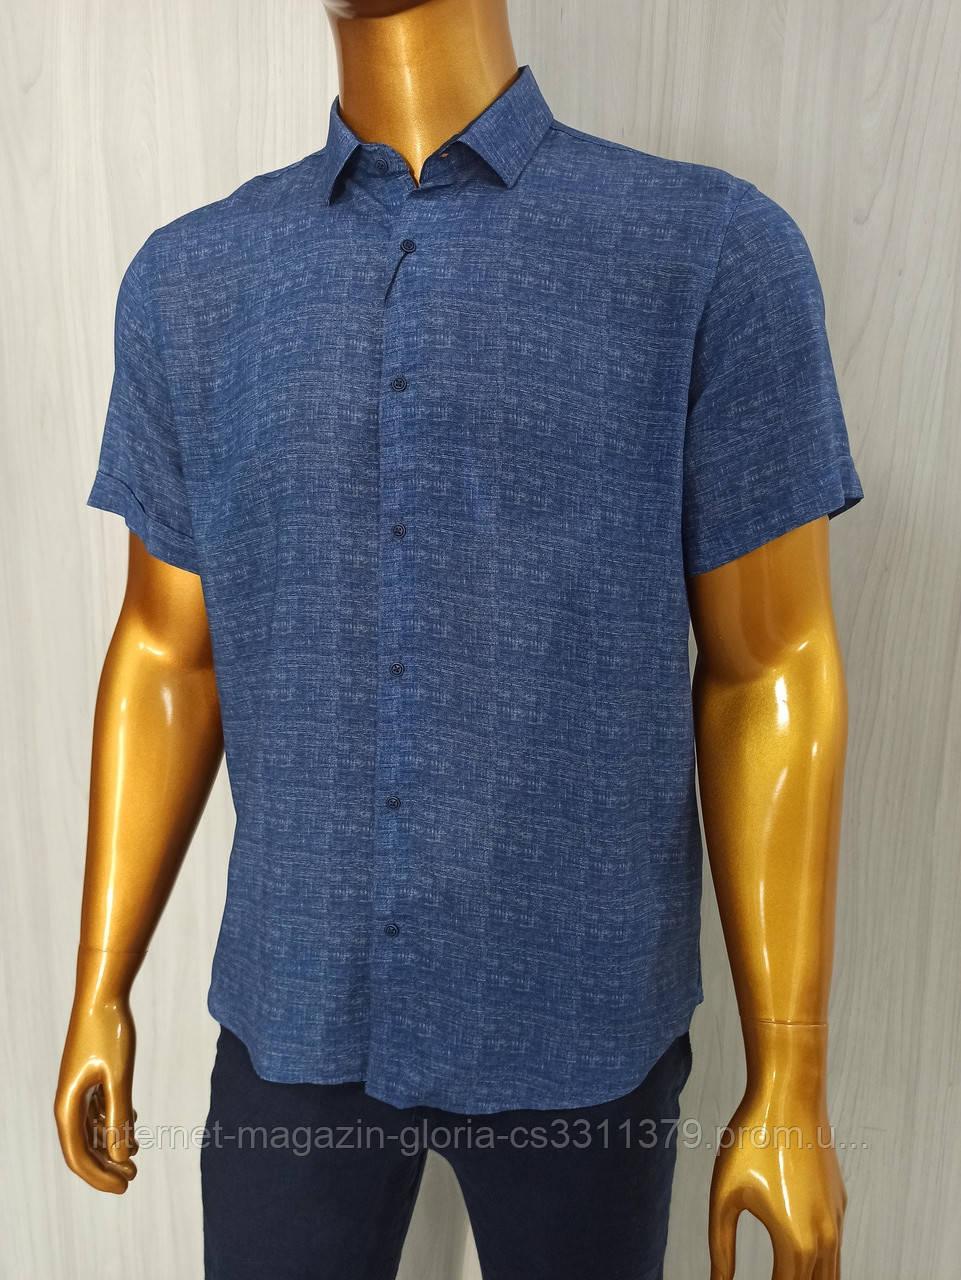 Мужская рубашка FLP. mod.46890. Размеры: M,L,XL,2XL.